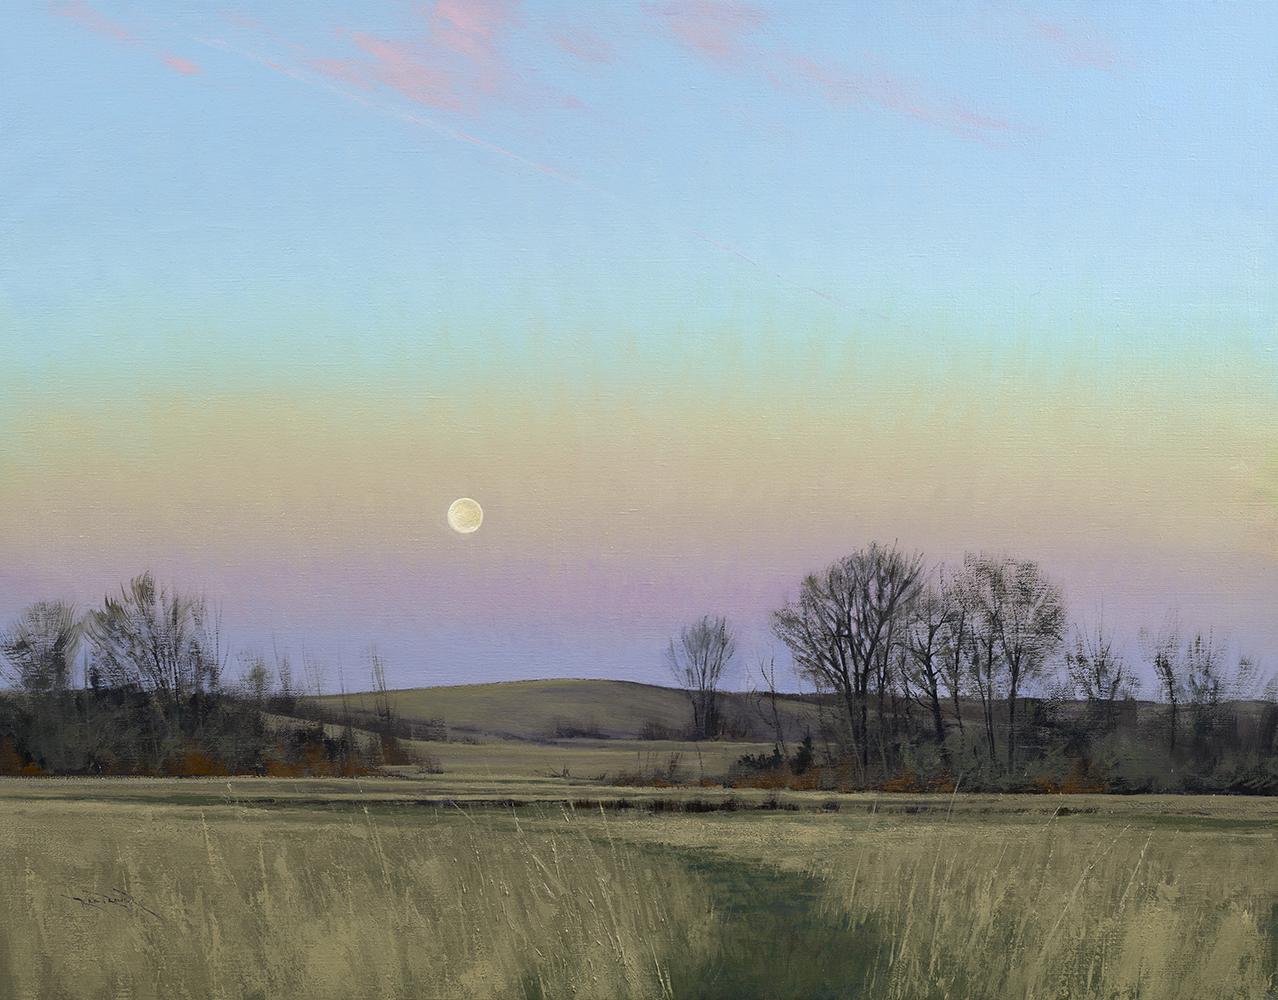 ben_bauer_bb1097_minnesota_glacial_lakes_area_at_dusk.jpg